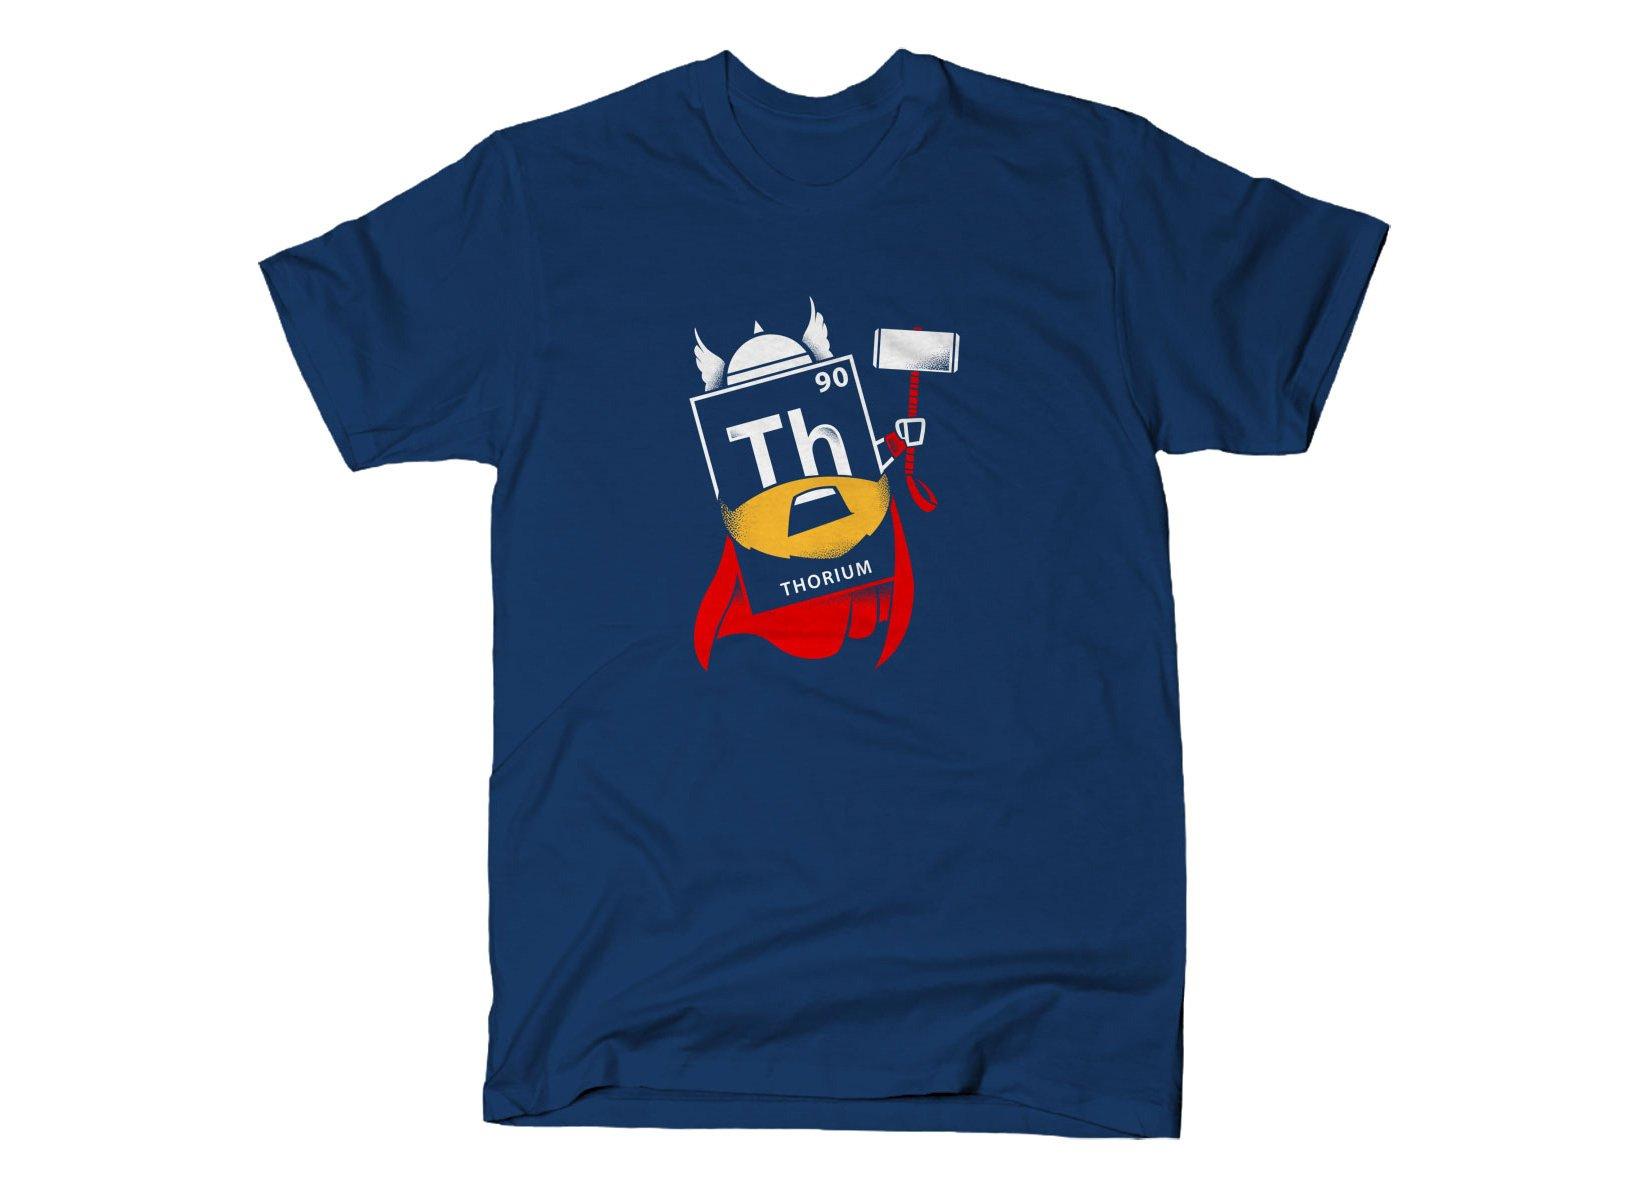 Thorium on Mens T-Shirt